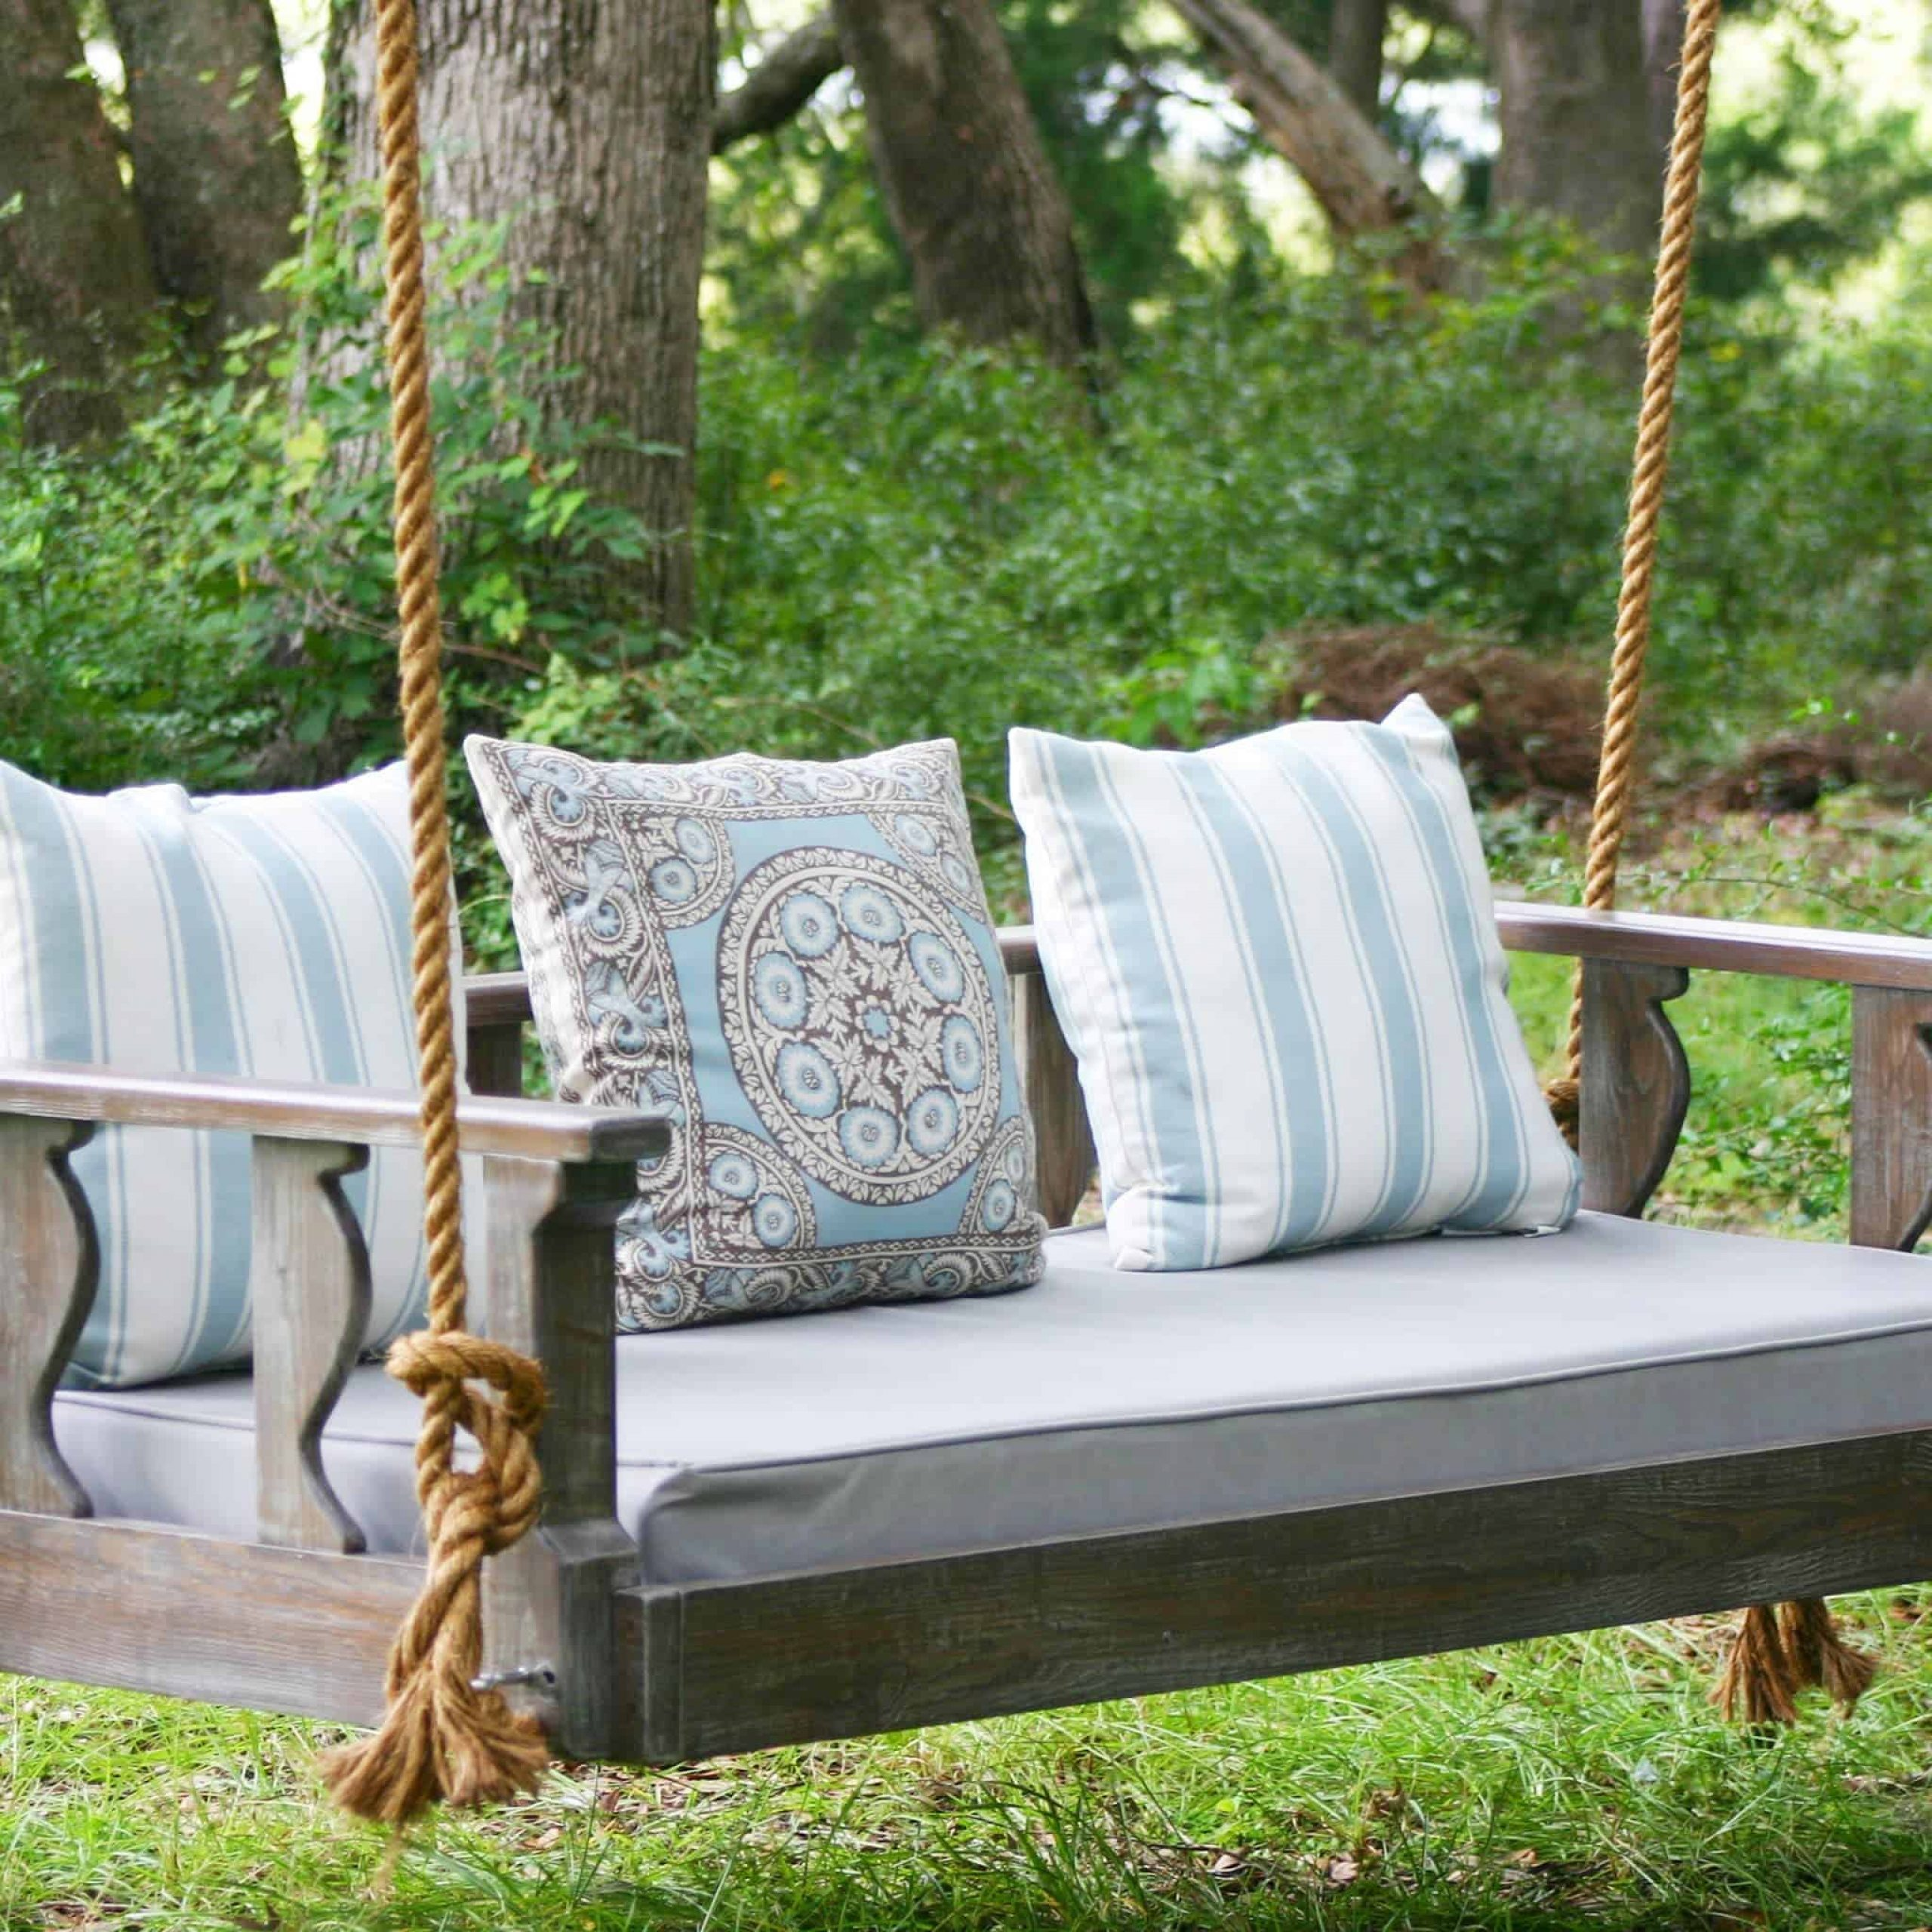 Bed Swings And Porch Swings, Handmadevintage Porch Swings Within Classic Porch Swings (Image 8 of 25)